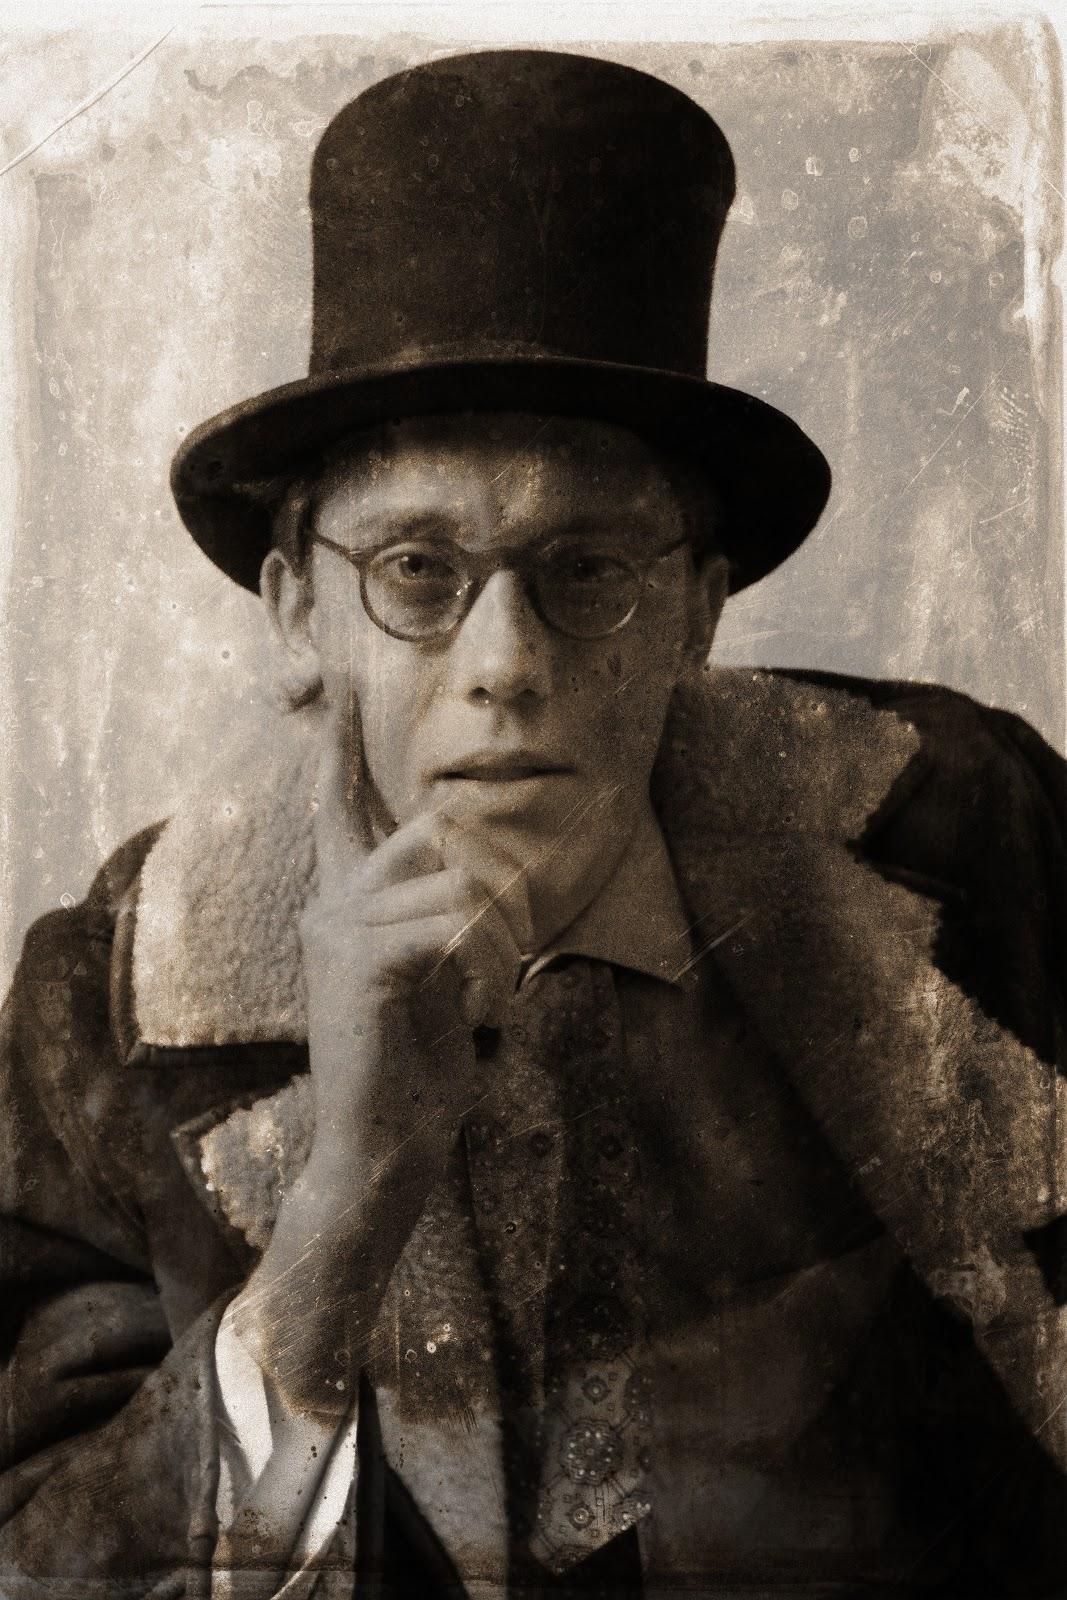 Victorian Daguerreotype Portraits Photography And Film